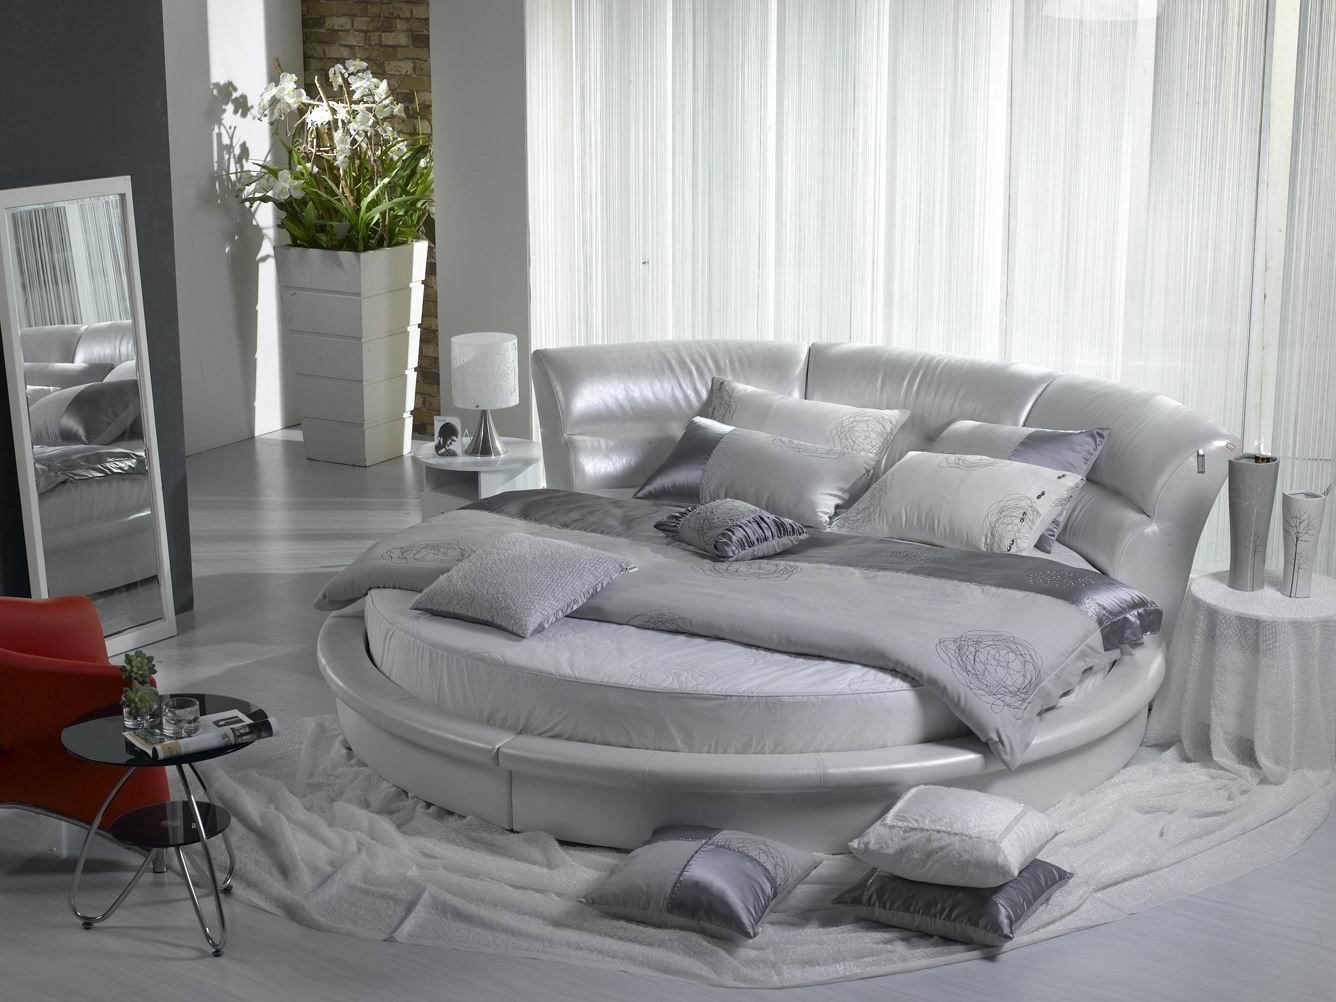 تصميم غرف نوم سرير دائري | المرسال